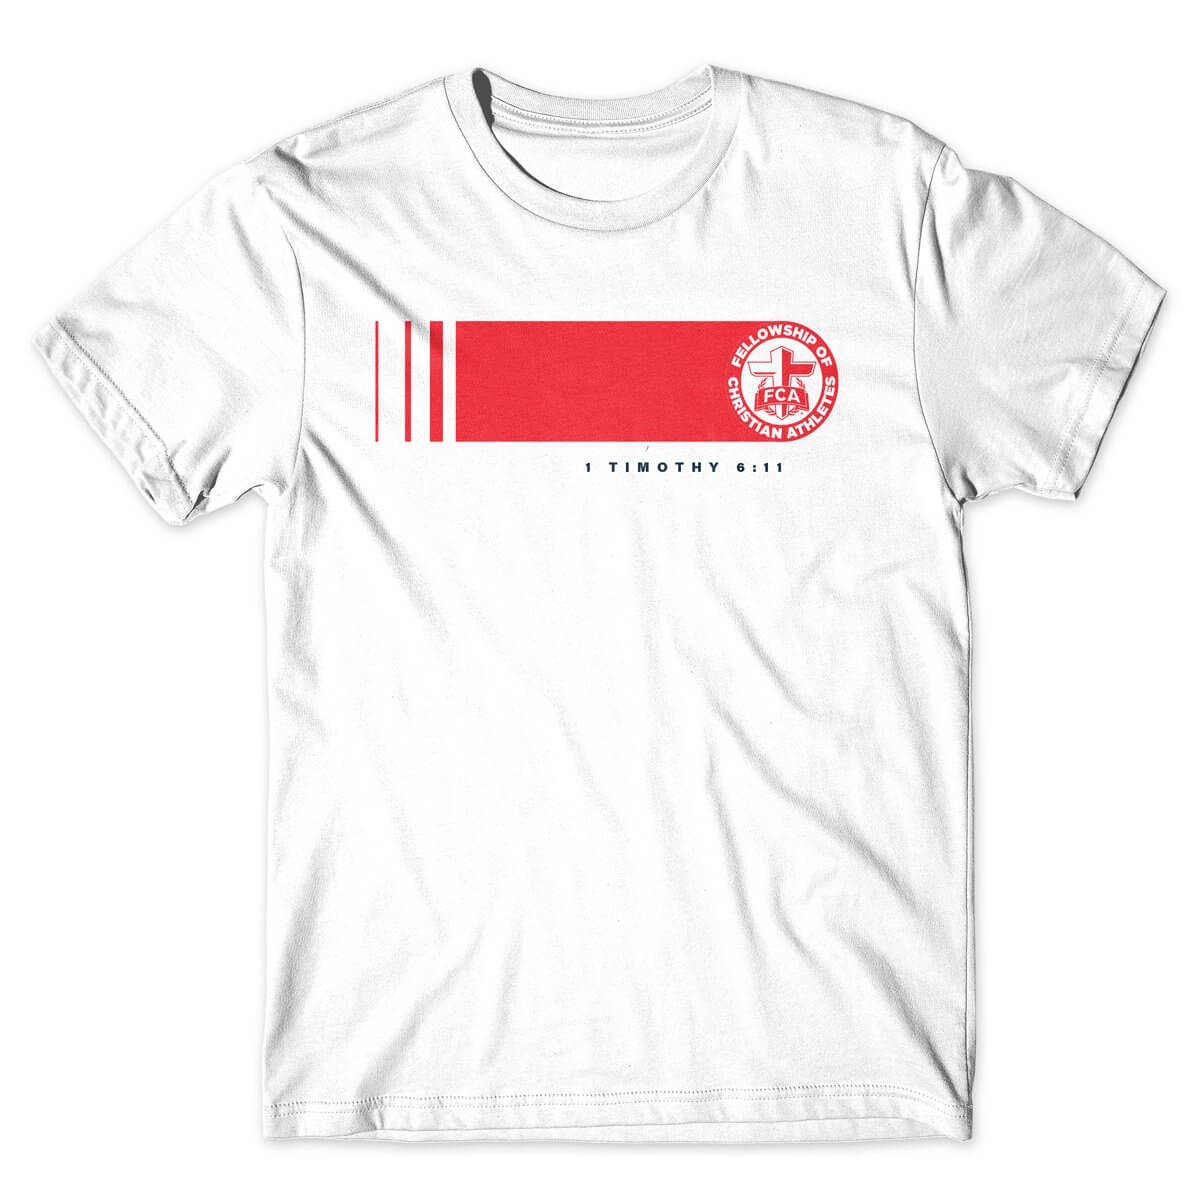 Fellowship of Christian Athletes white logo rush tshirt